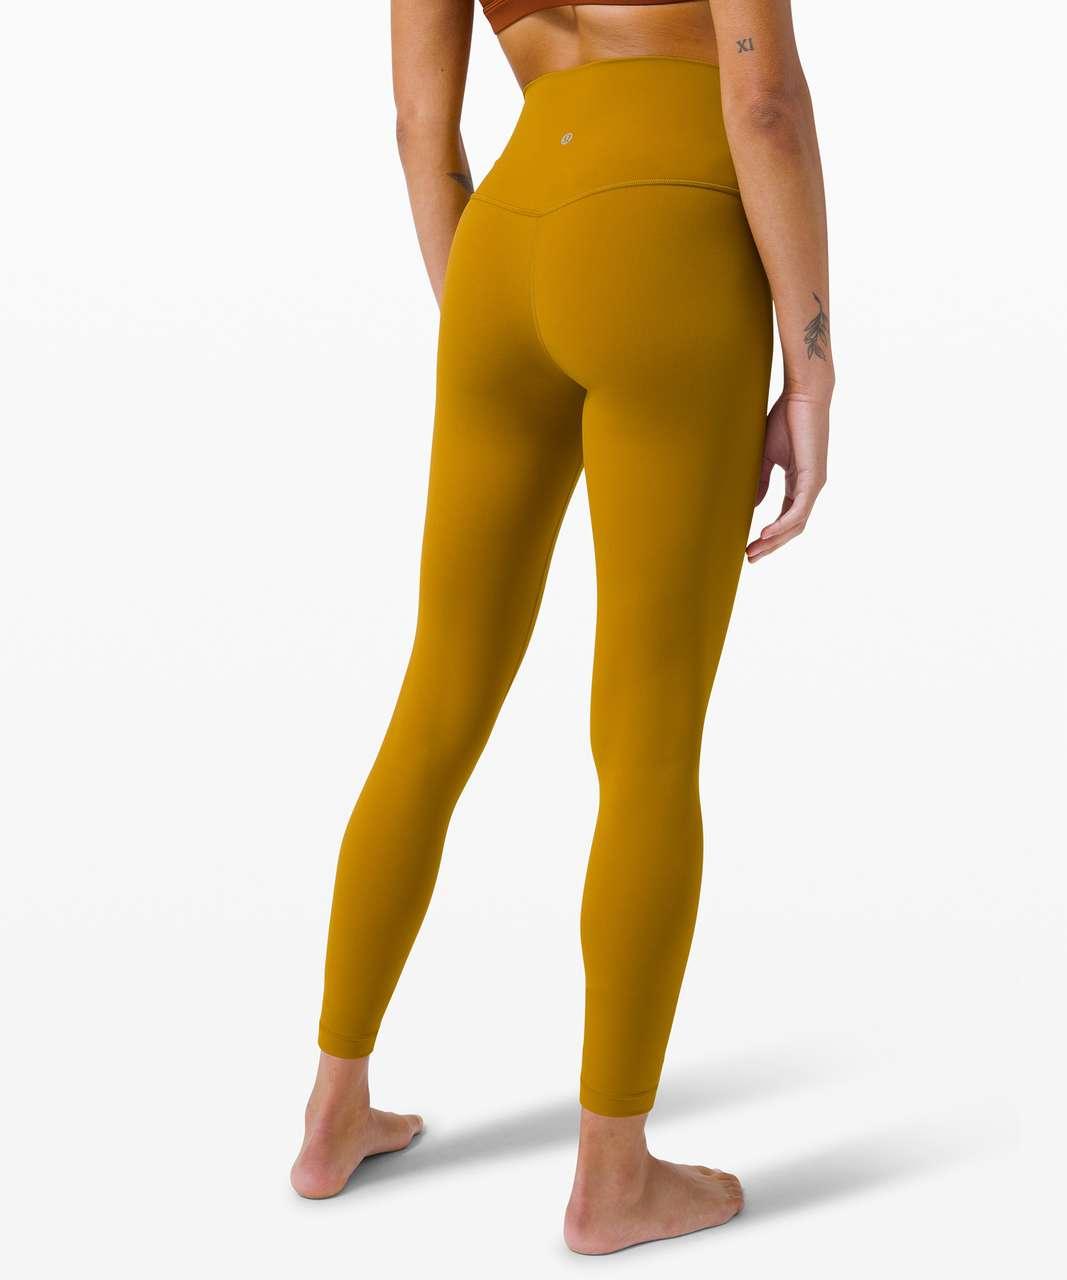 "Lululemon Align Pant 25"" - Gold Spice"